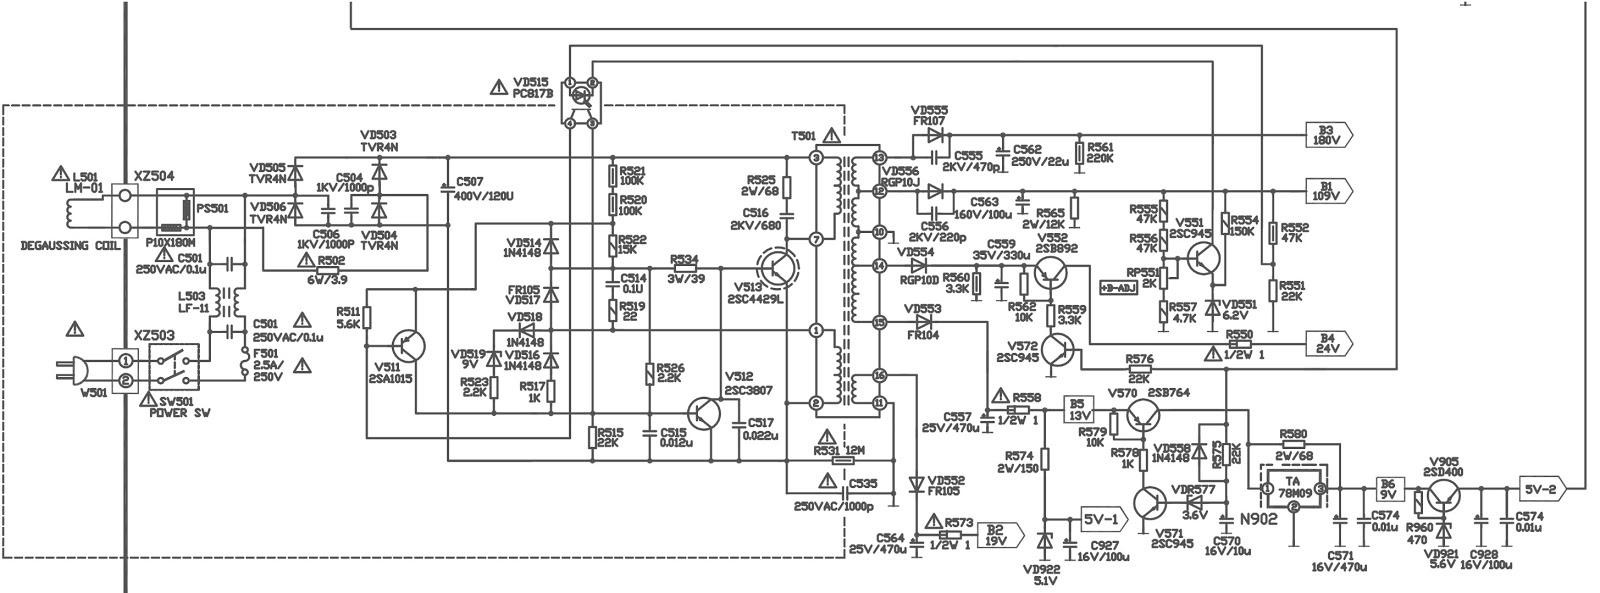 AKIRA 21FZS1 - TV - SMPS - SCHEMATIC DIAGRAM [CIRCUIT DIAGRAM ...